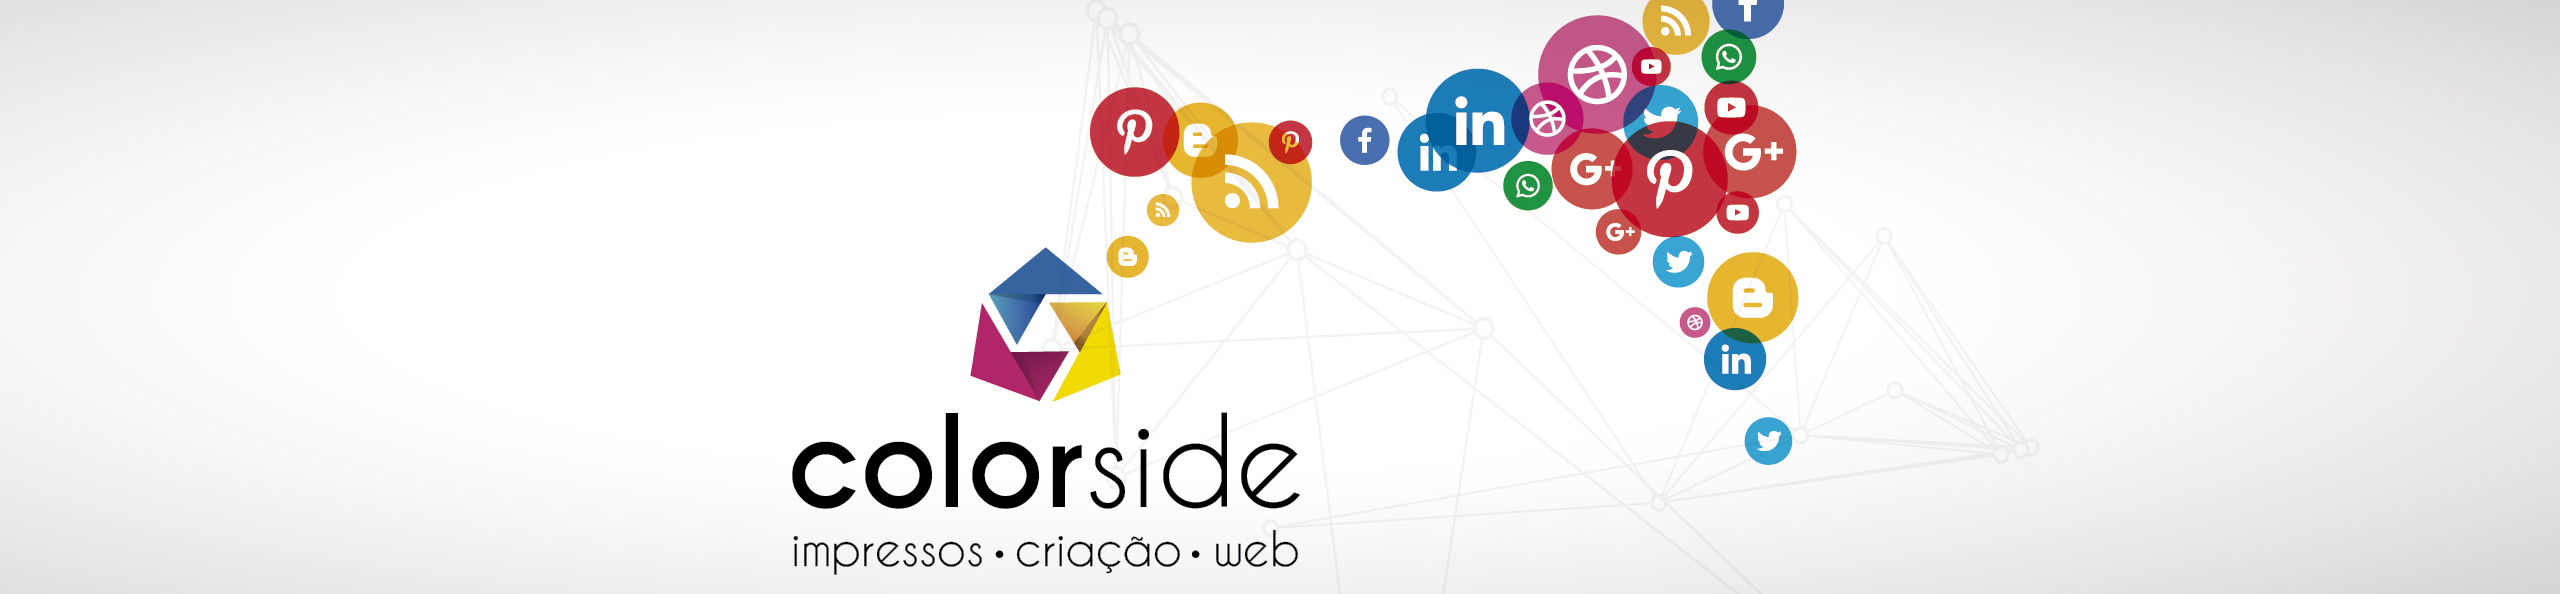 Banner Redes Sociais Site modelo tb mobile.jpg